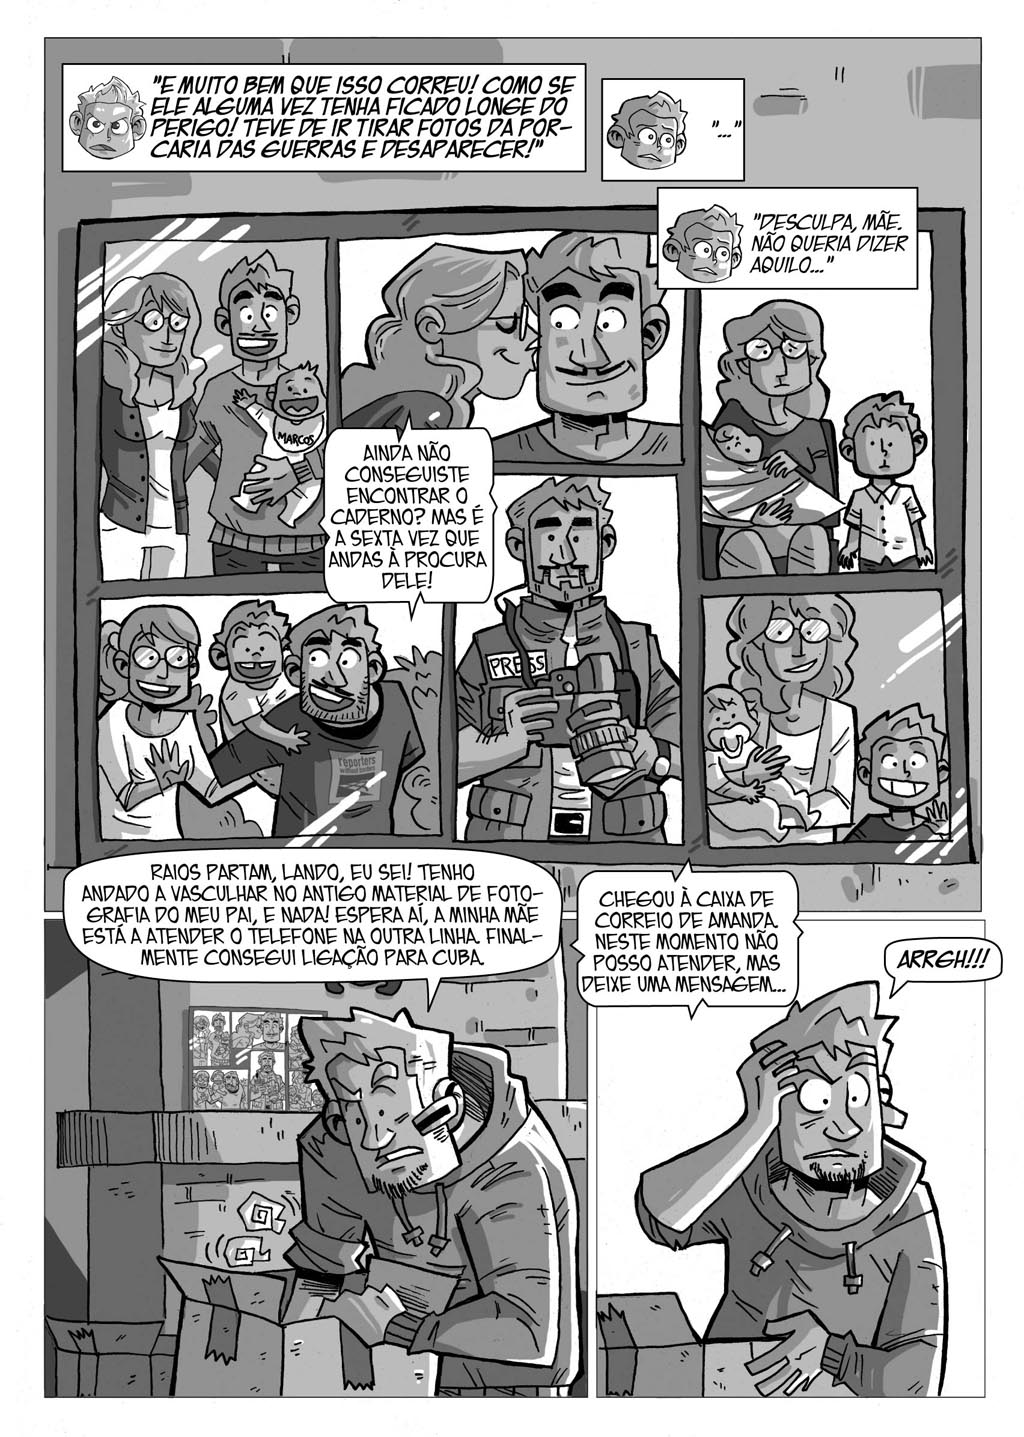 Portento - Página 13